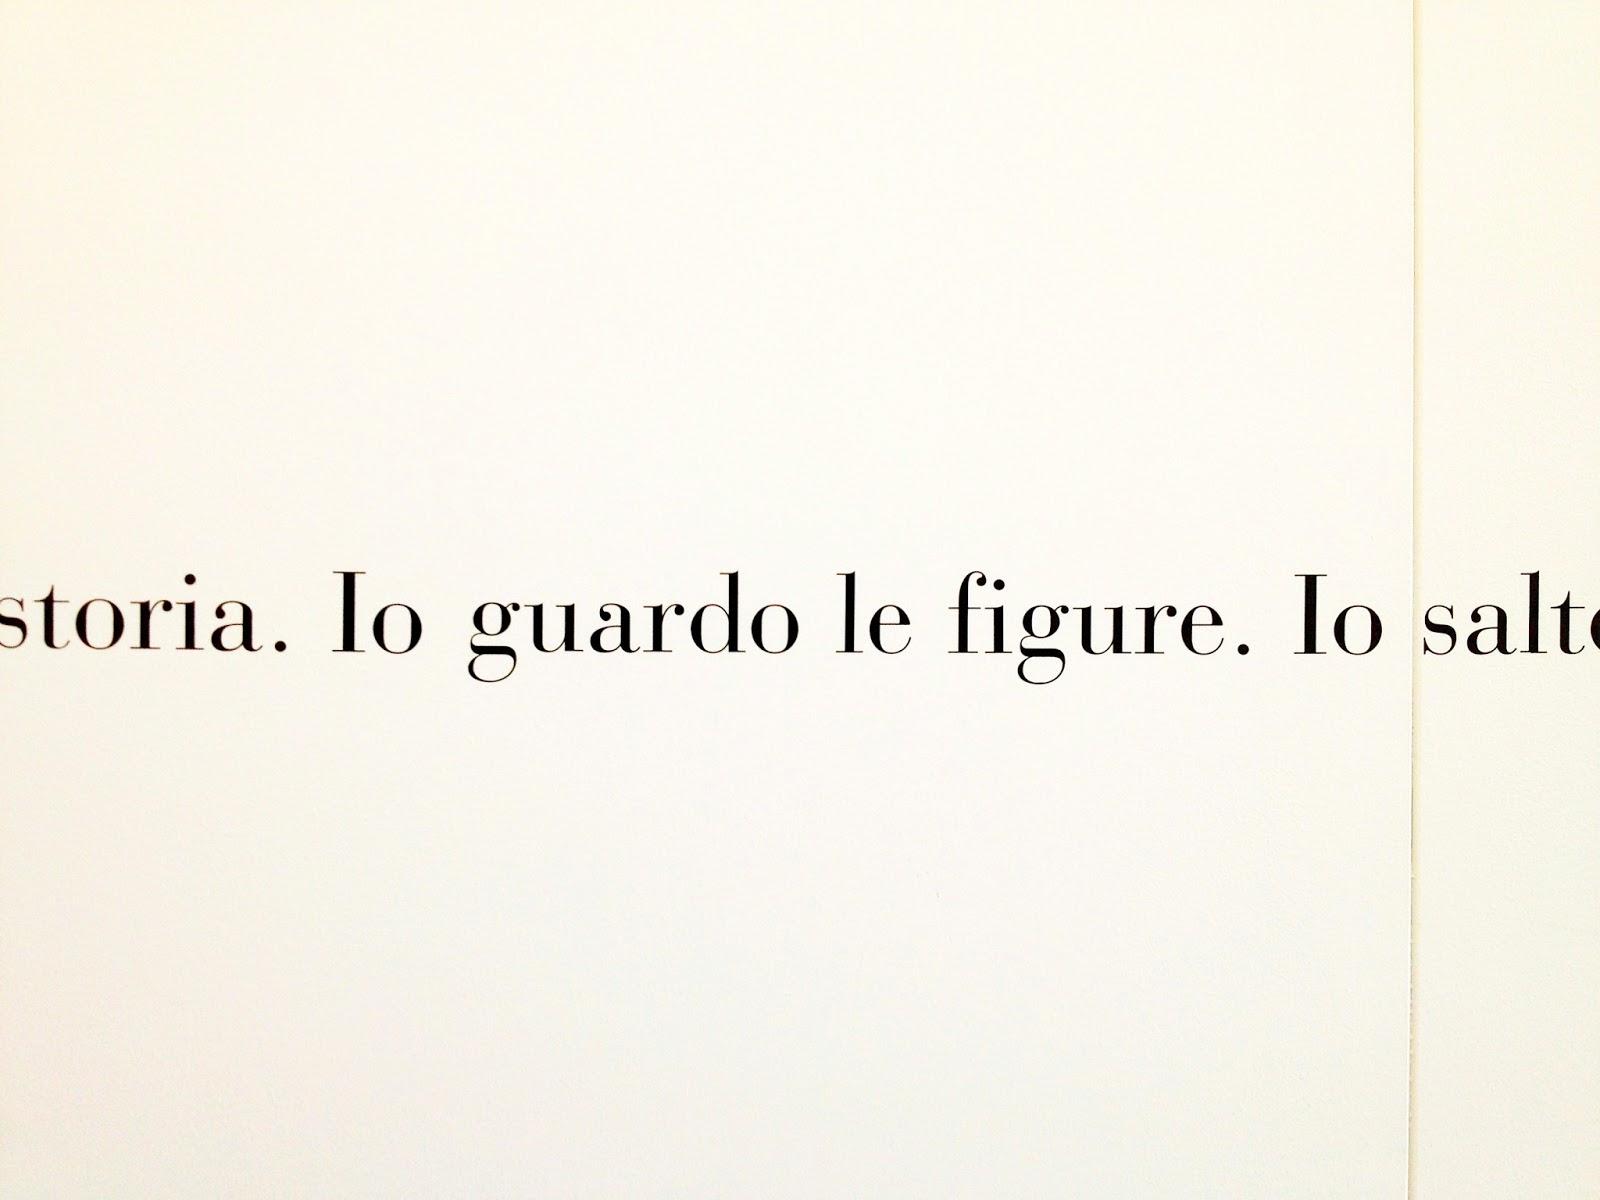 Frasi In Spagnolo Amore Tumblr